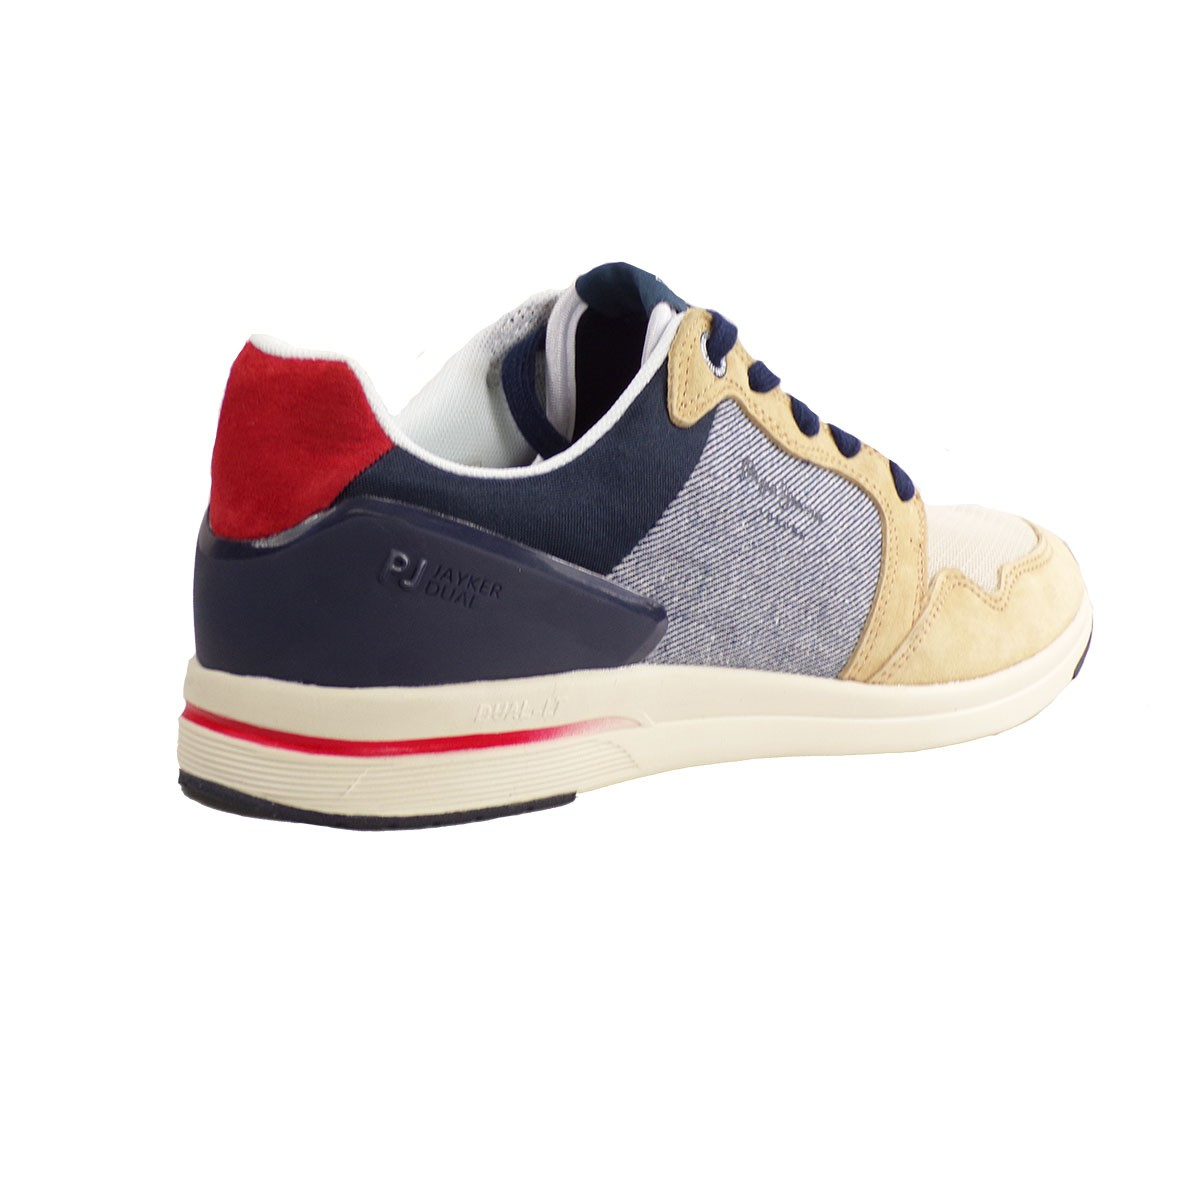 3578292bae3 Pepe Jeans JAYKER Sneakers Ανδρικά Παπούτσια PMS30514-847 Ταμπά ...